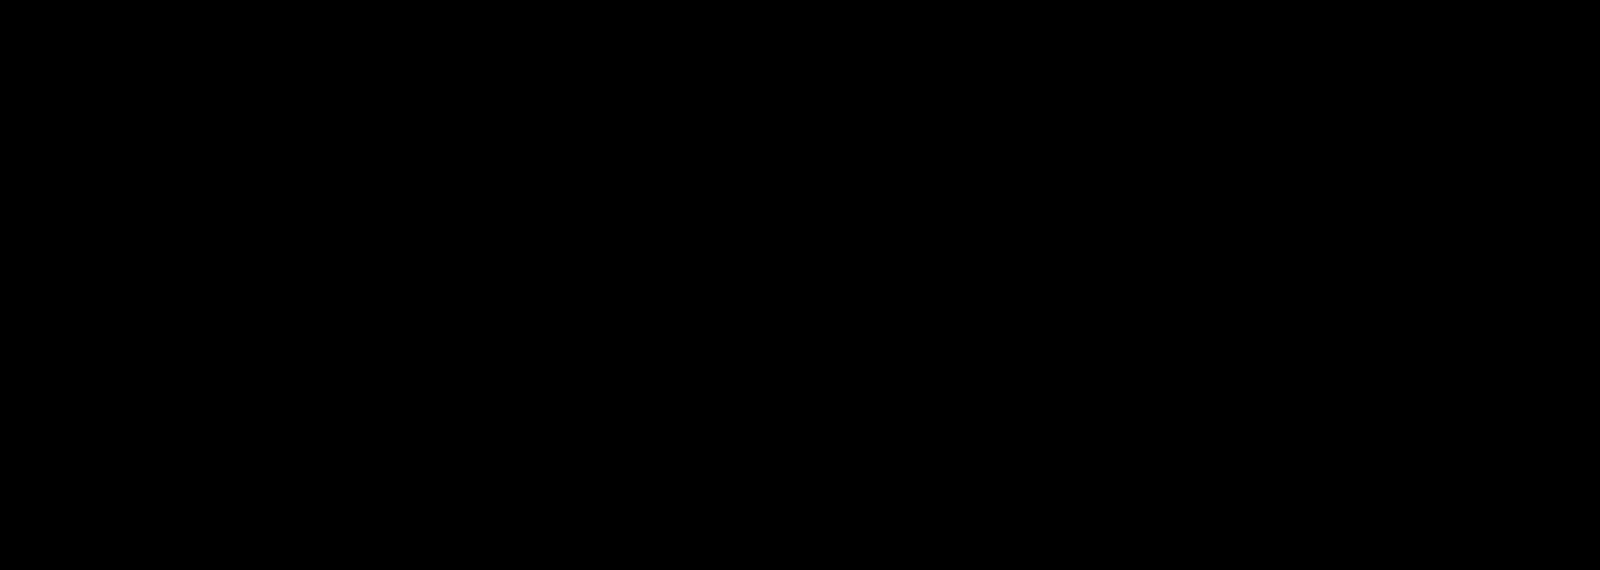 vector royalty free Melonheadz LDS illustrating